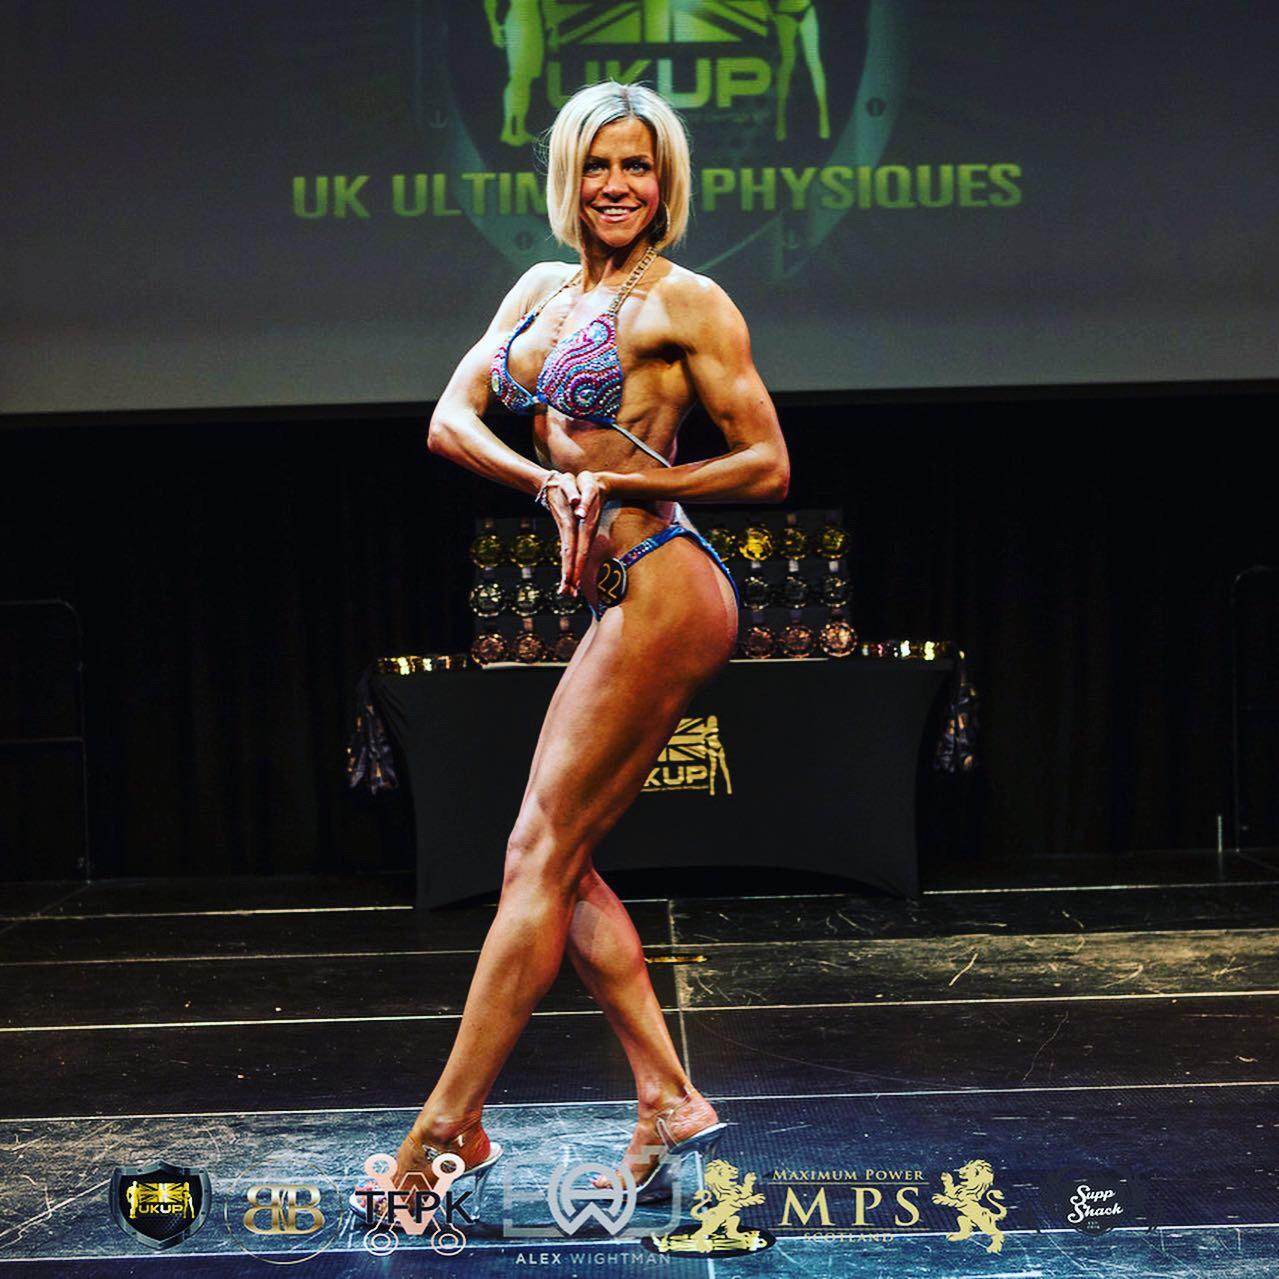 Real People Doing Stuff: Katy – Body Building Champion